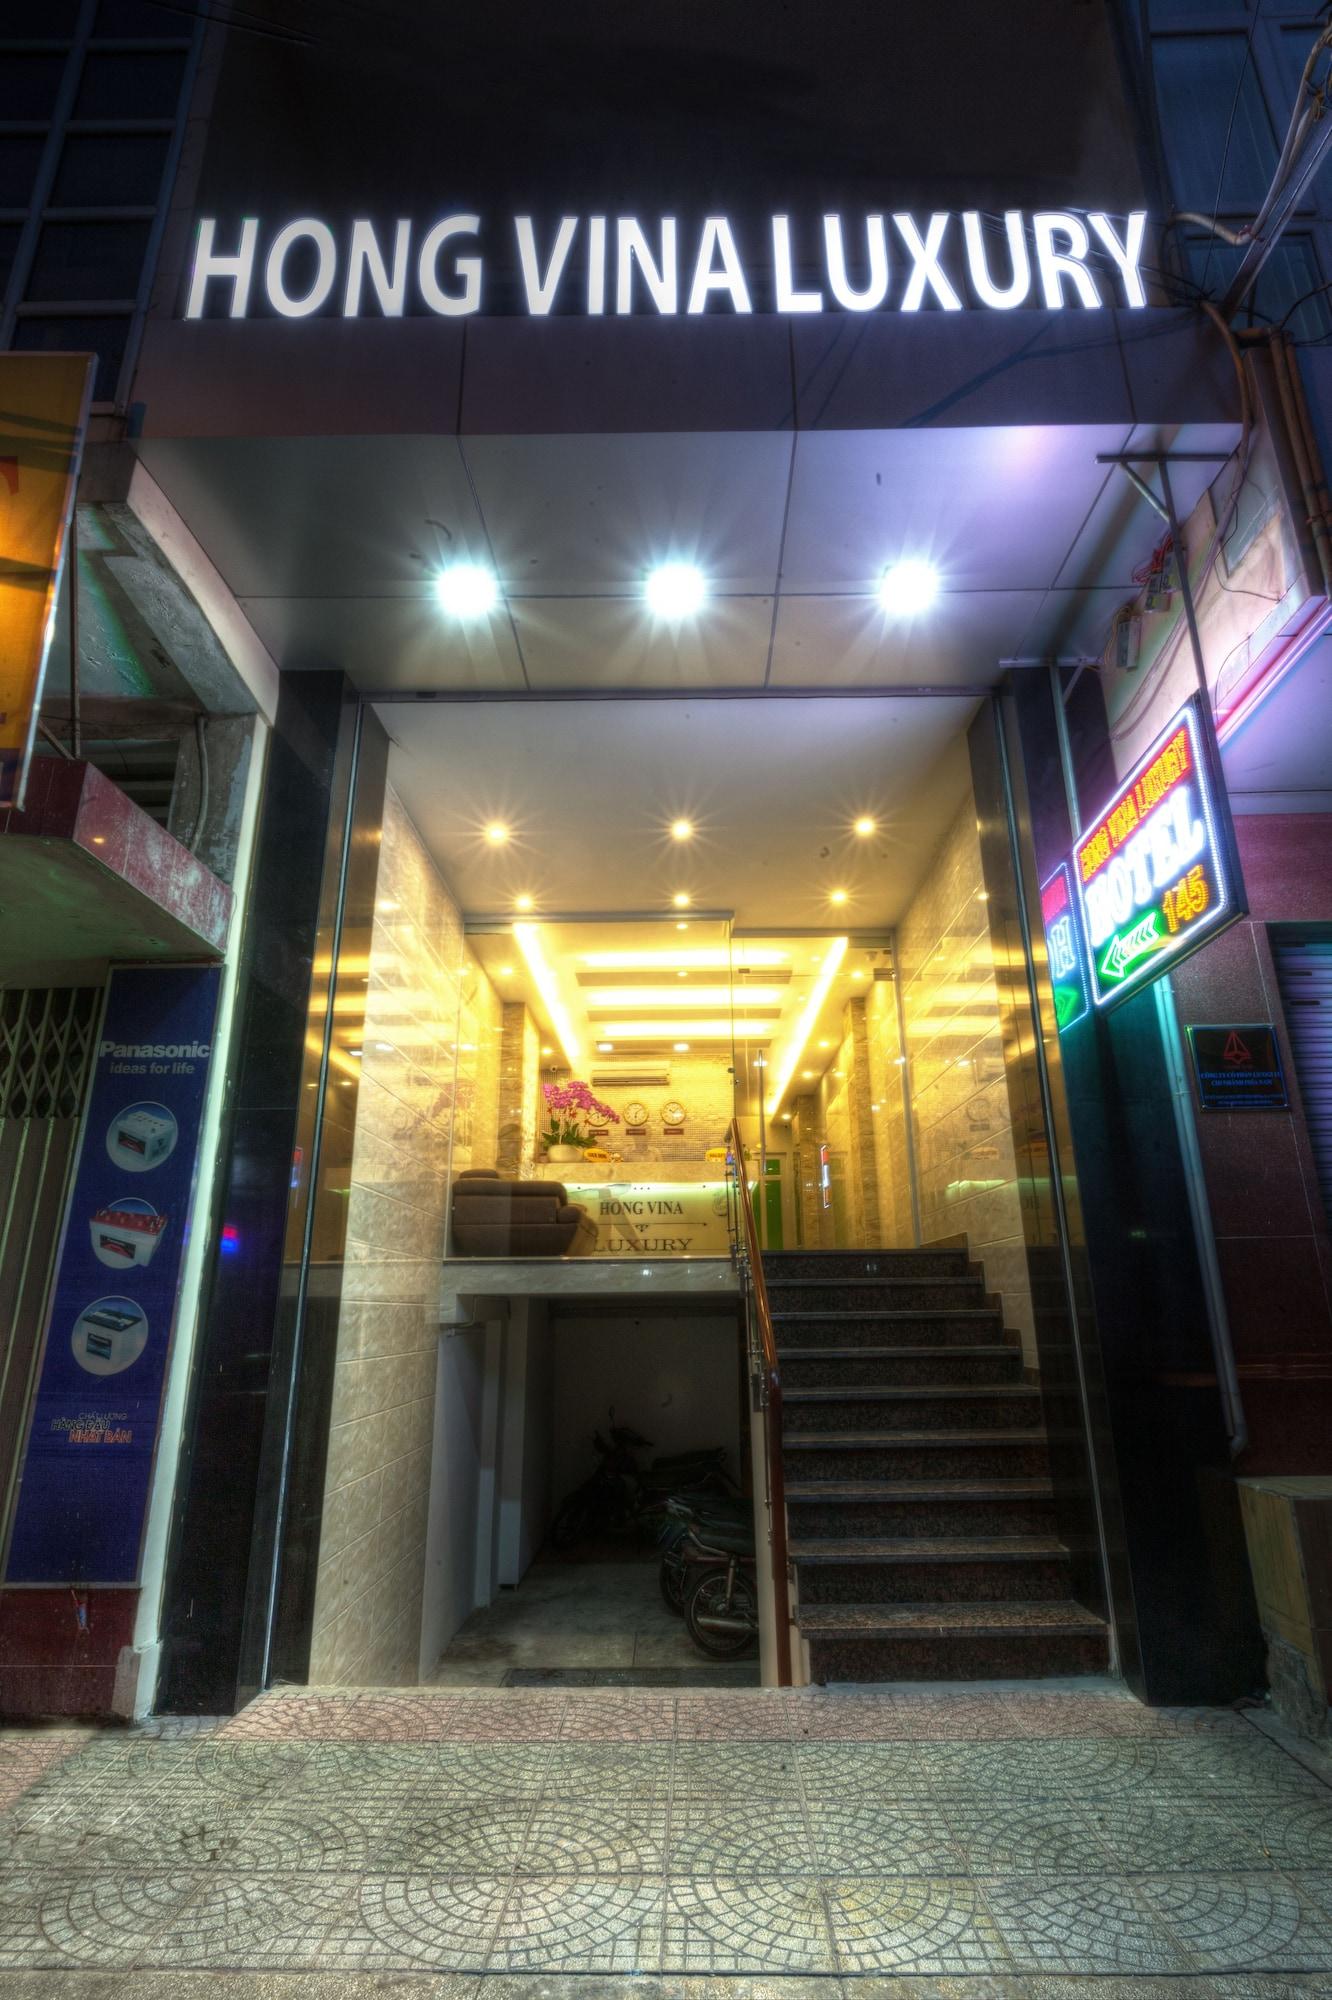 Hong Vina Luxury, Quận 1